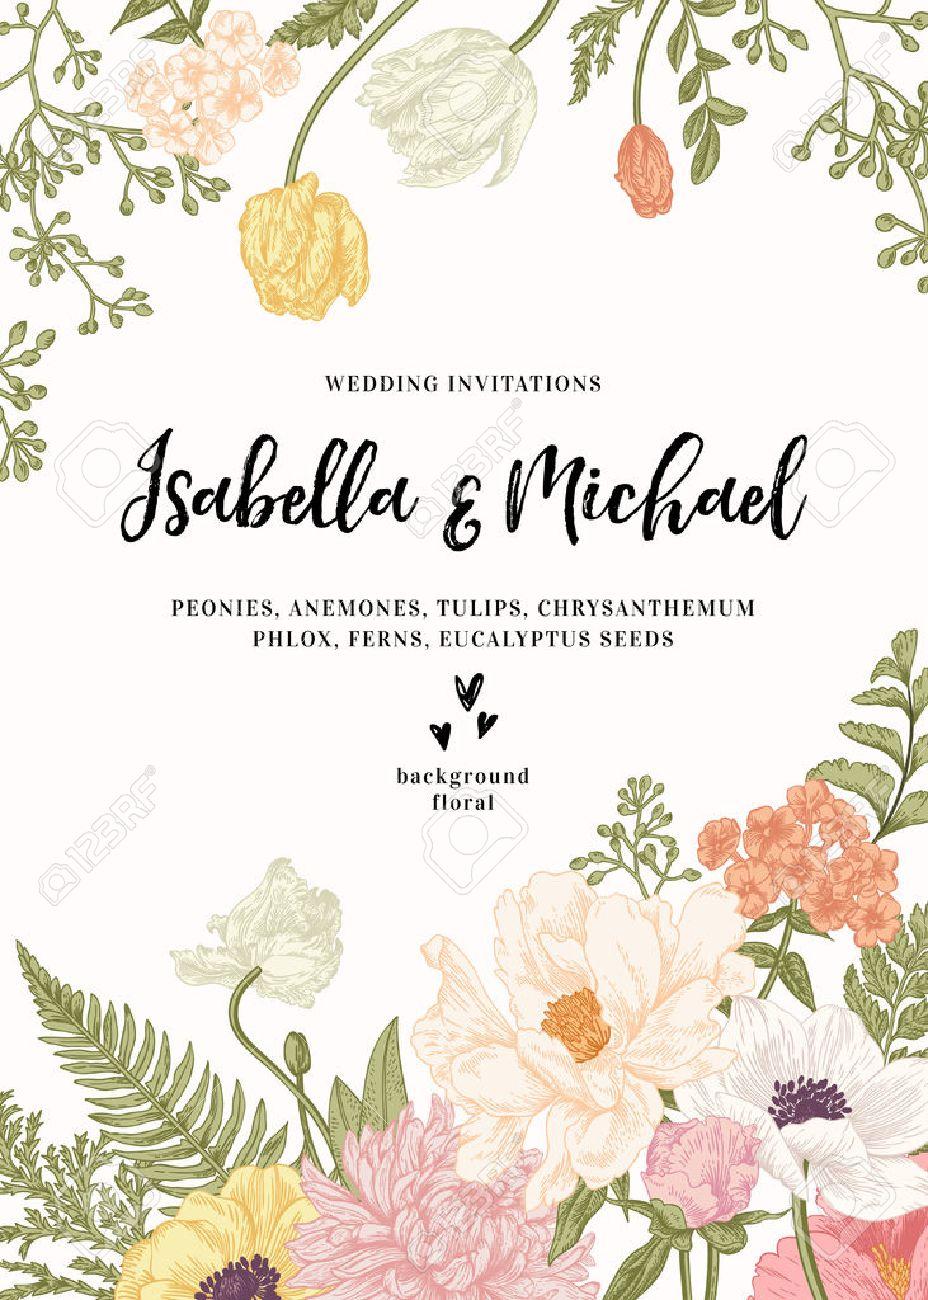 Vintage Wedding Invitation. Summer Garden Flowers. Peonies, Anemones ...